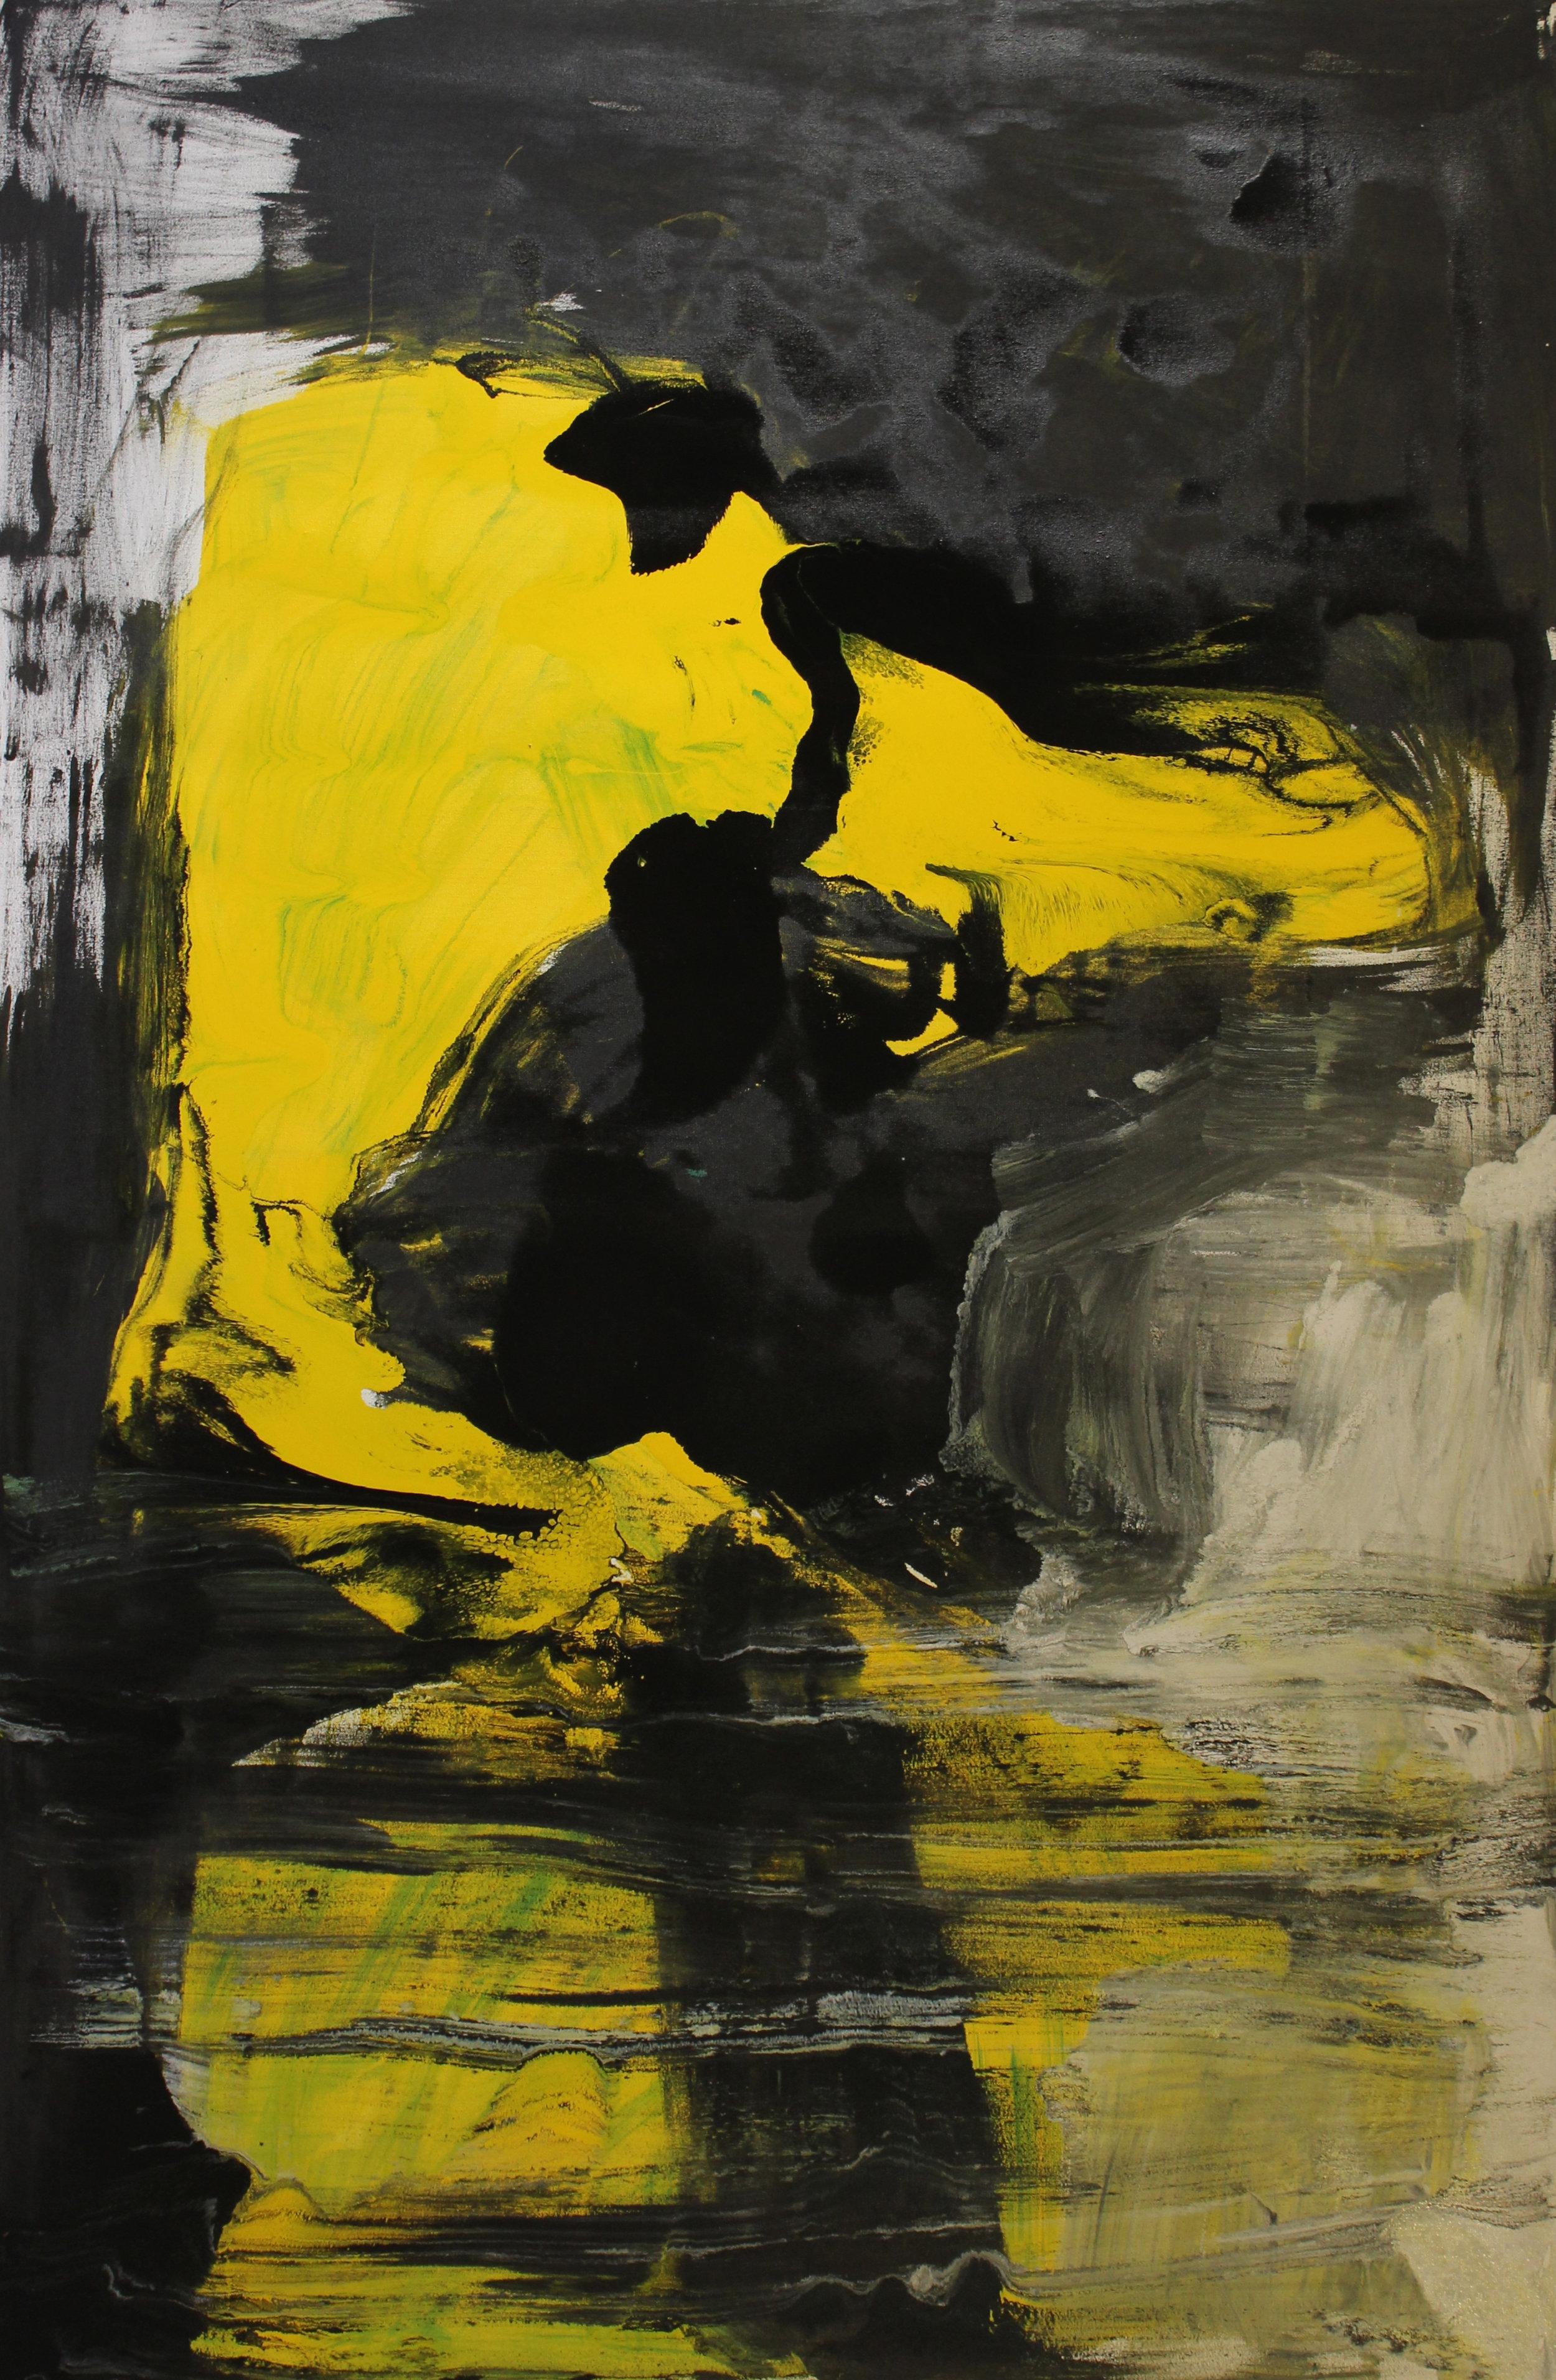 Untitled, 2014, enamel paint on canvas, 122 x 183 cm